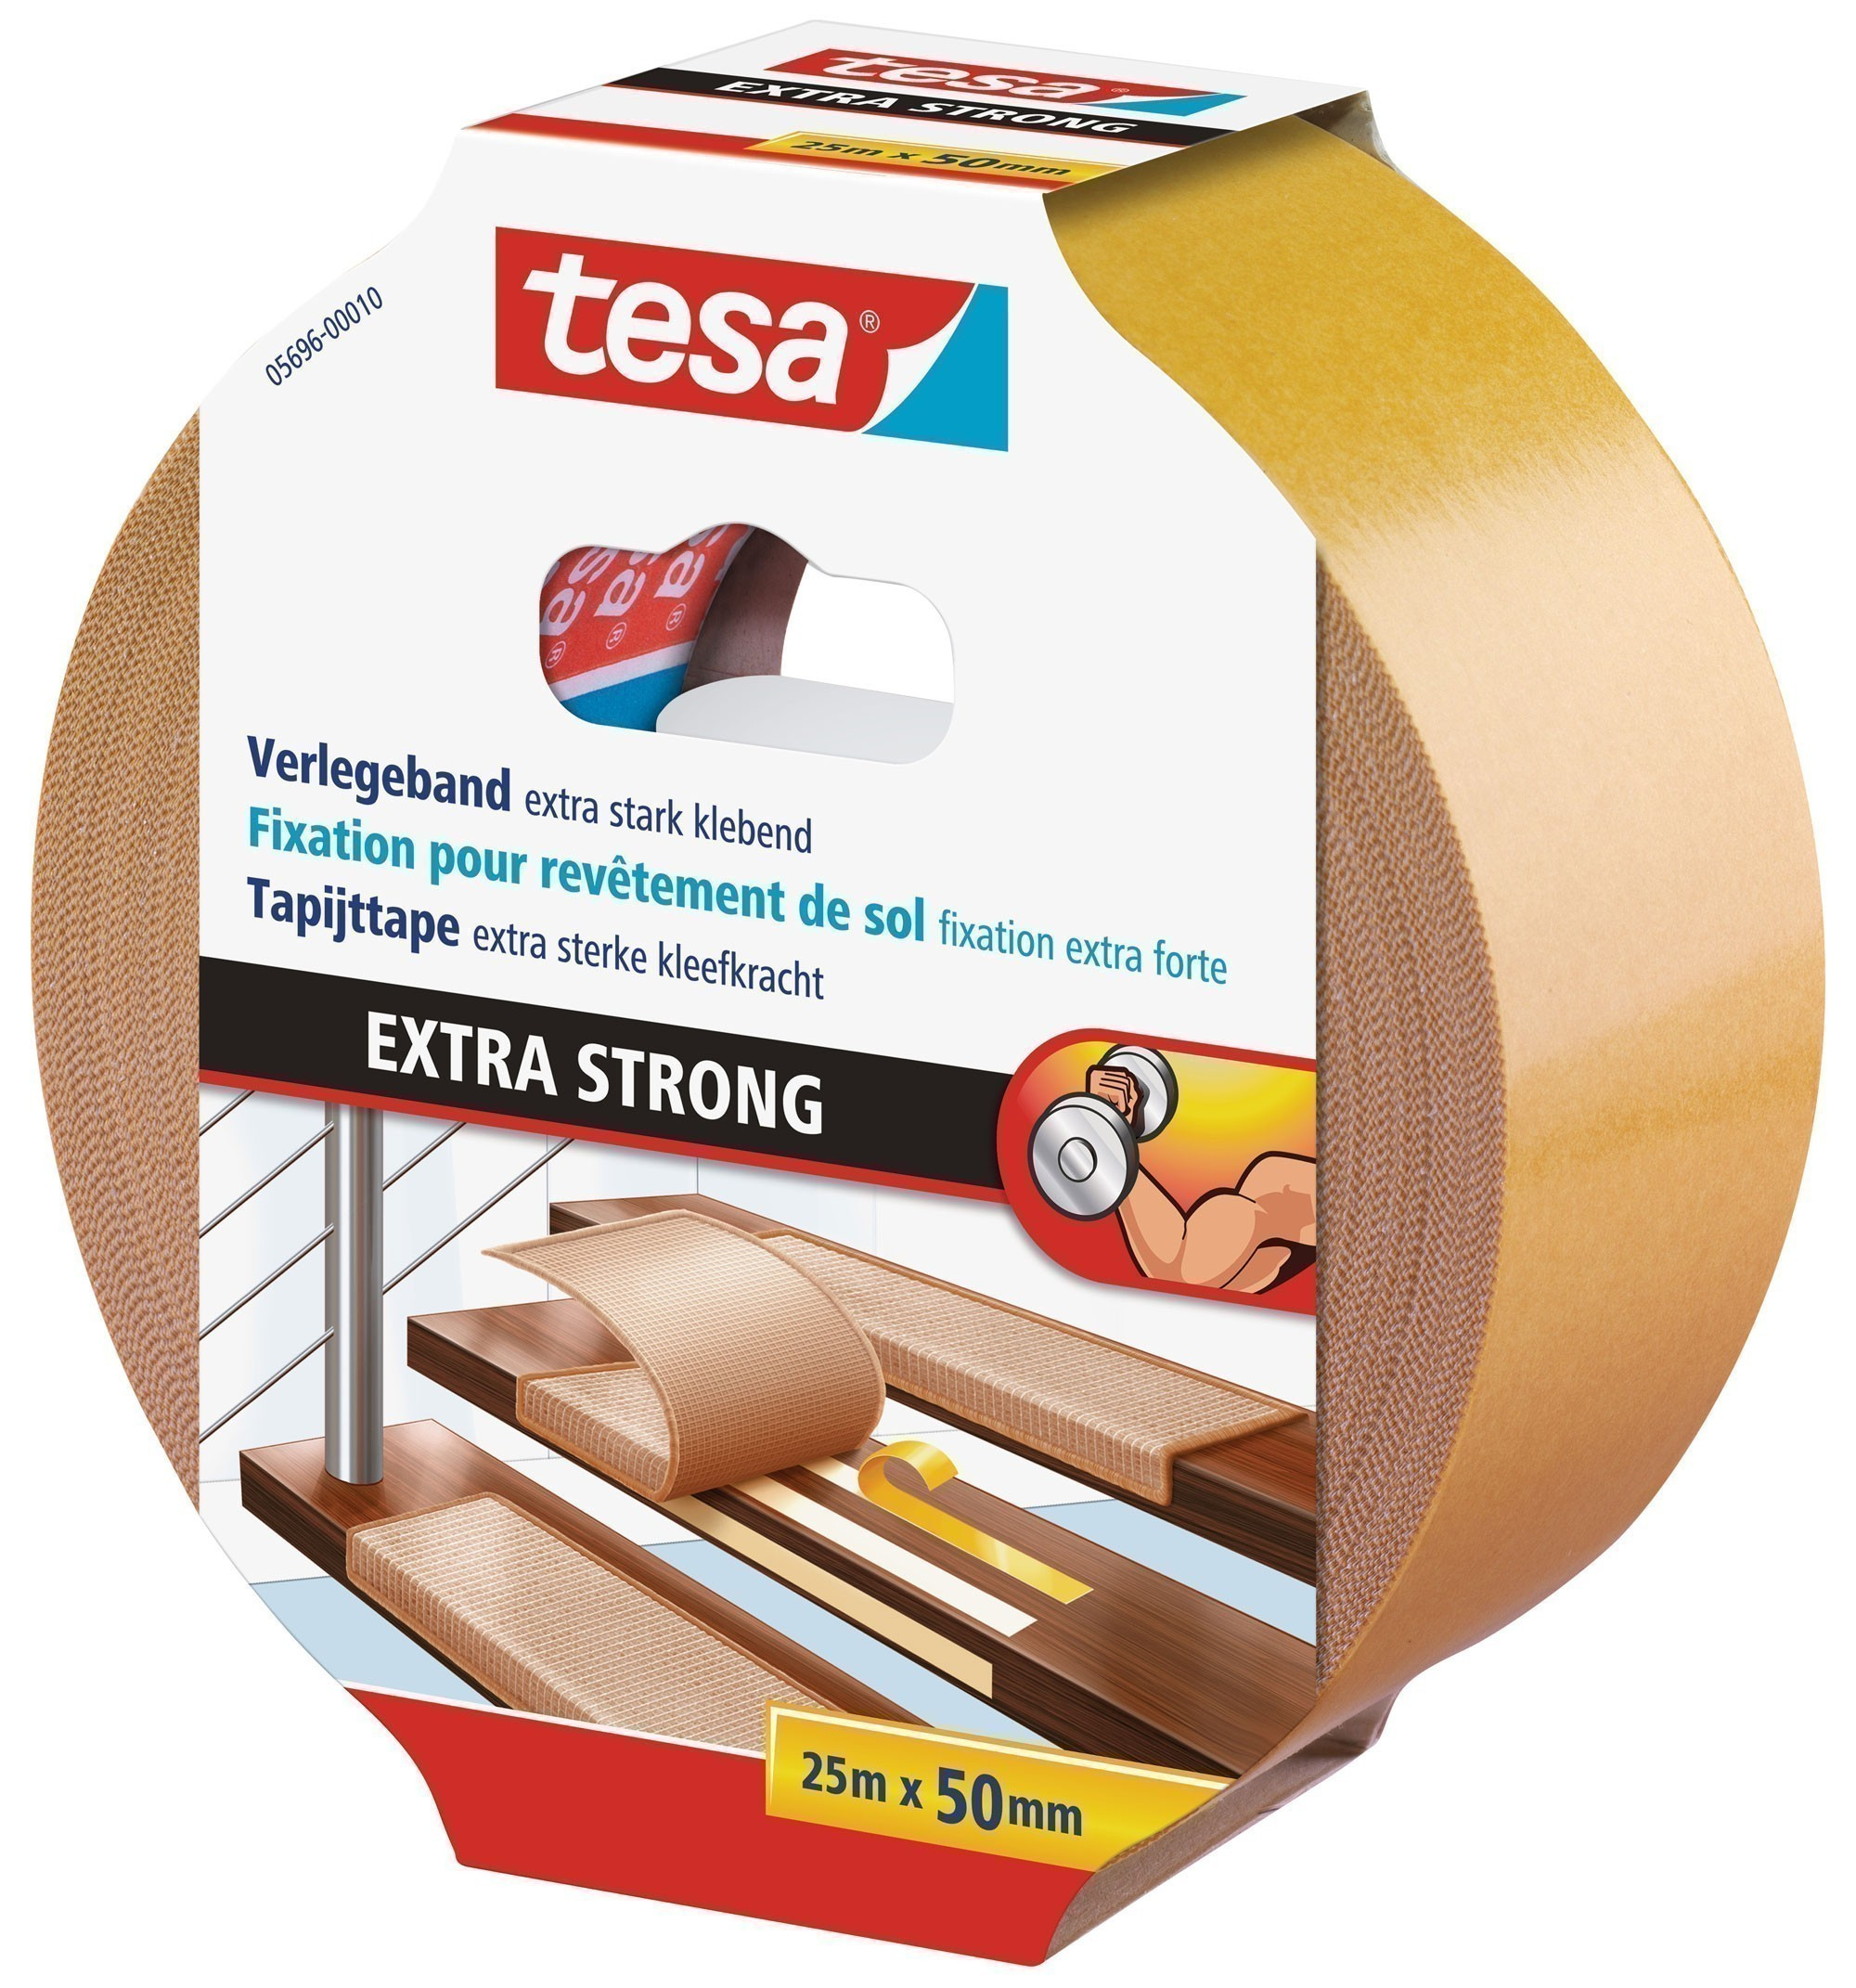 tesa® Verlegeband extra stark klebend 25 m x 50 mm Bild 1